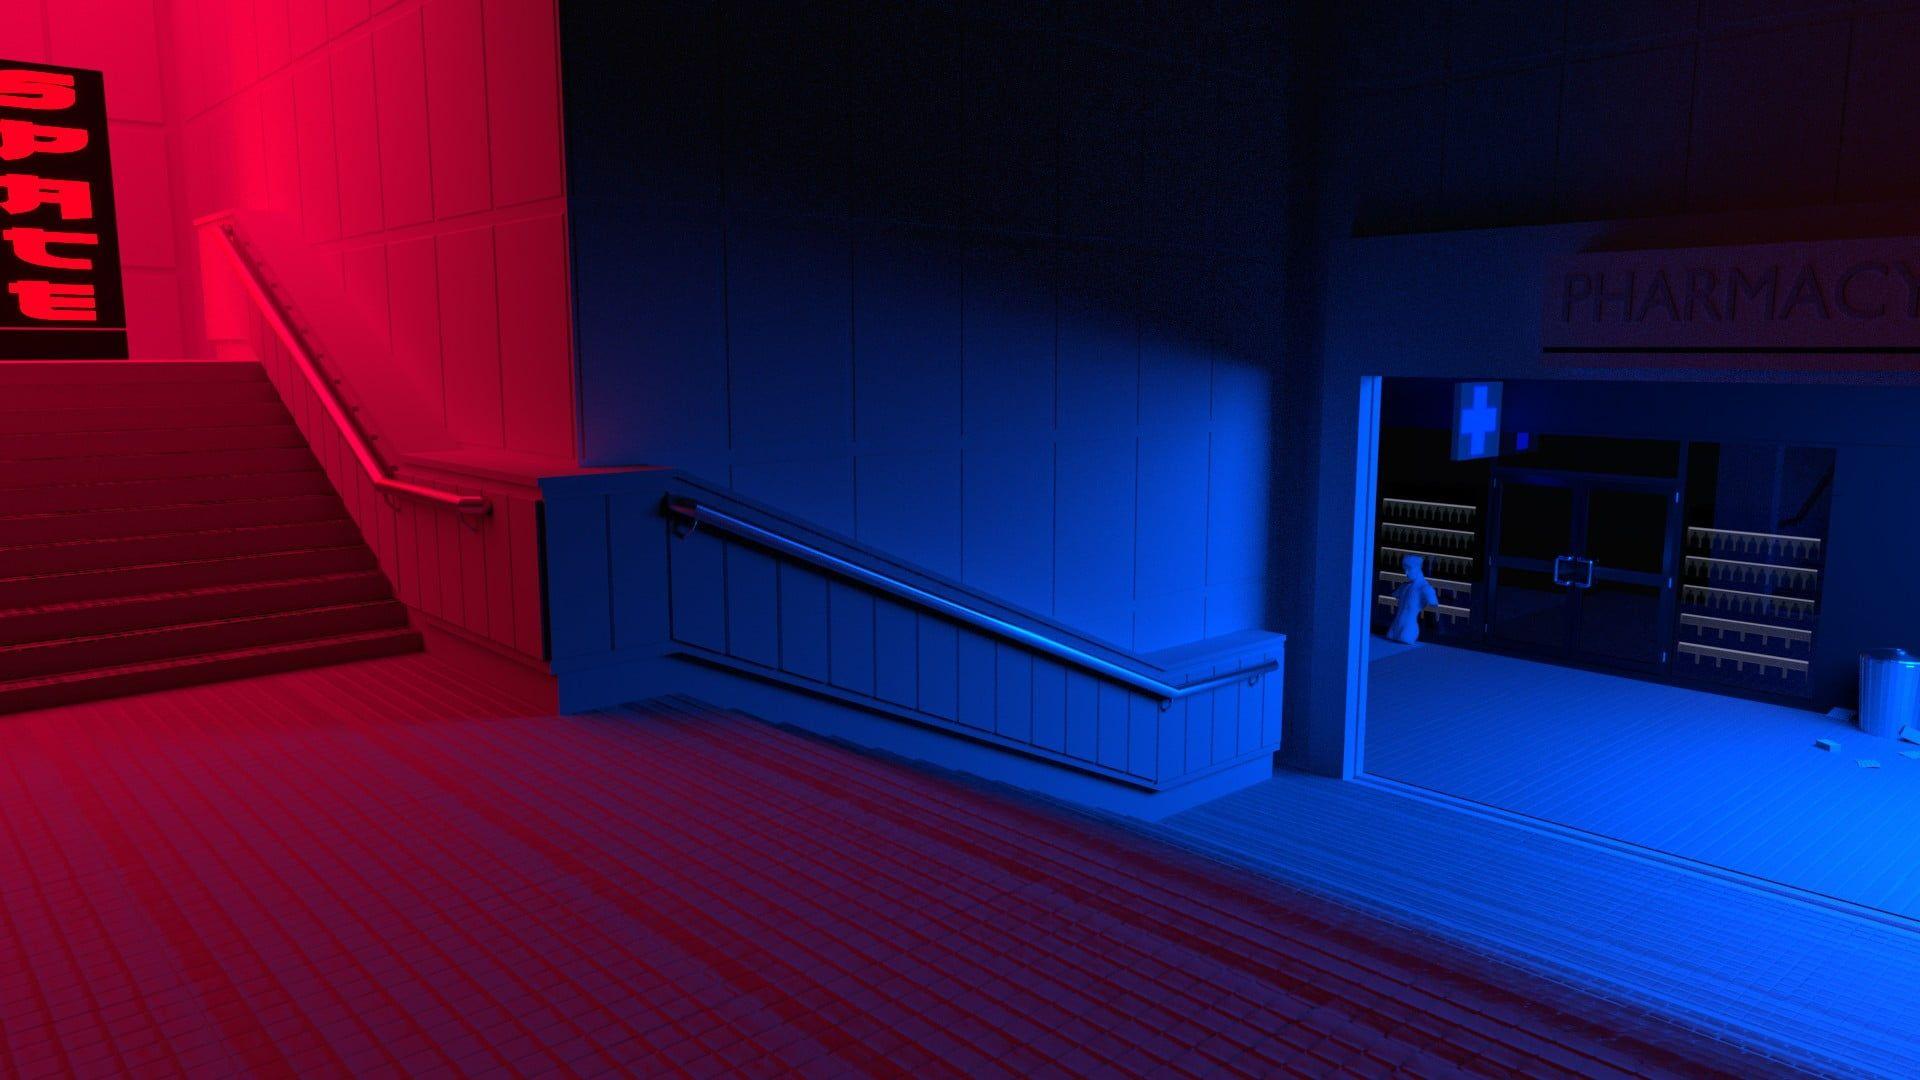 Black And White Wooden Bed Frame Red Blue Stairs Vaporwave 1080p Wallpaper Hdwallpaper Desktop Vaporwave Wallpaper Blue Aesthetic Blue Wallpapers